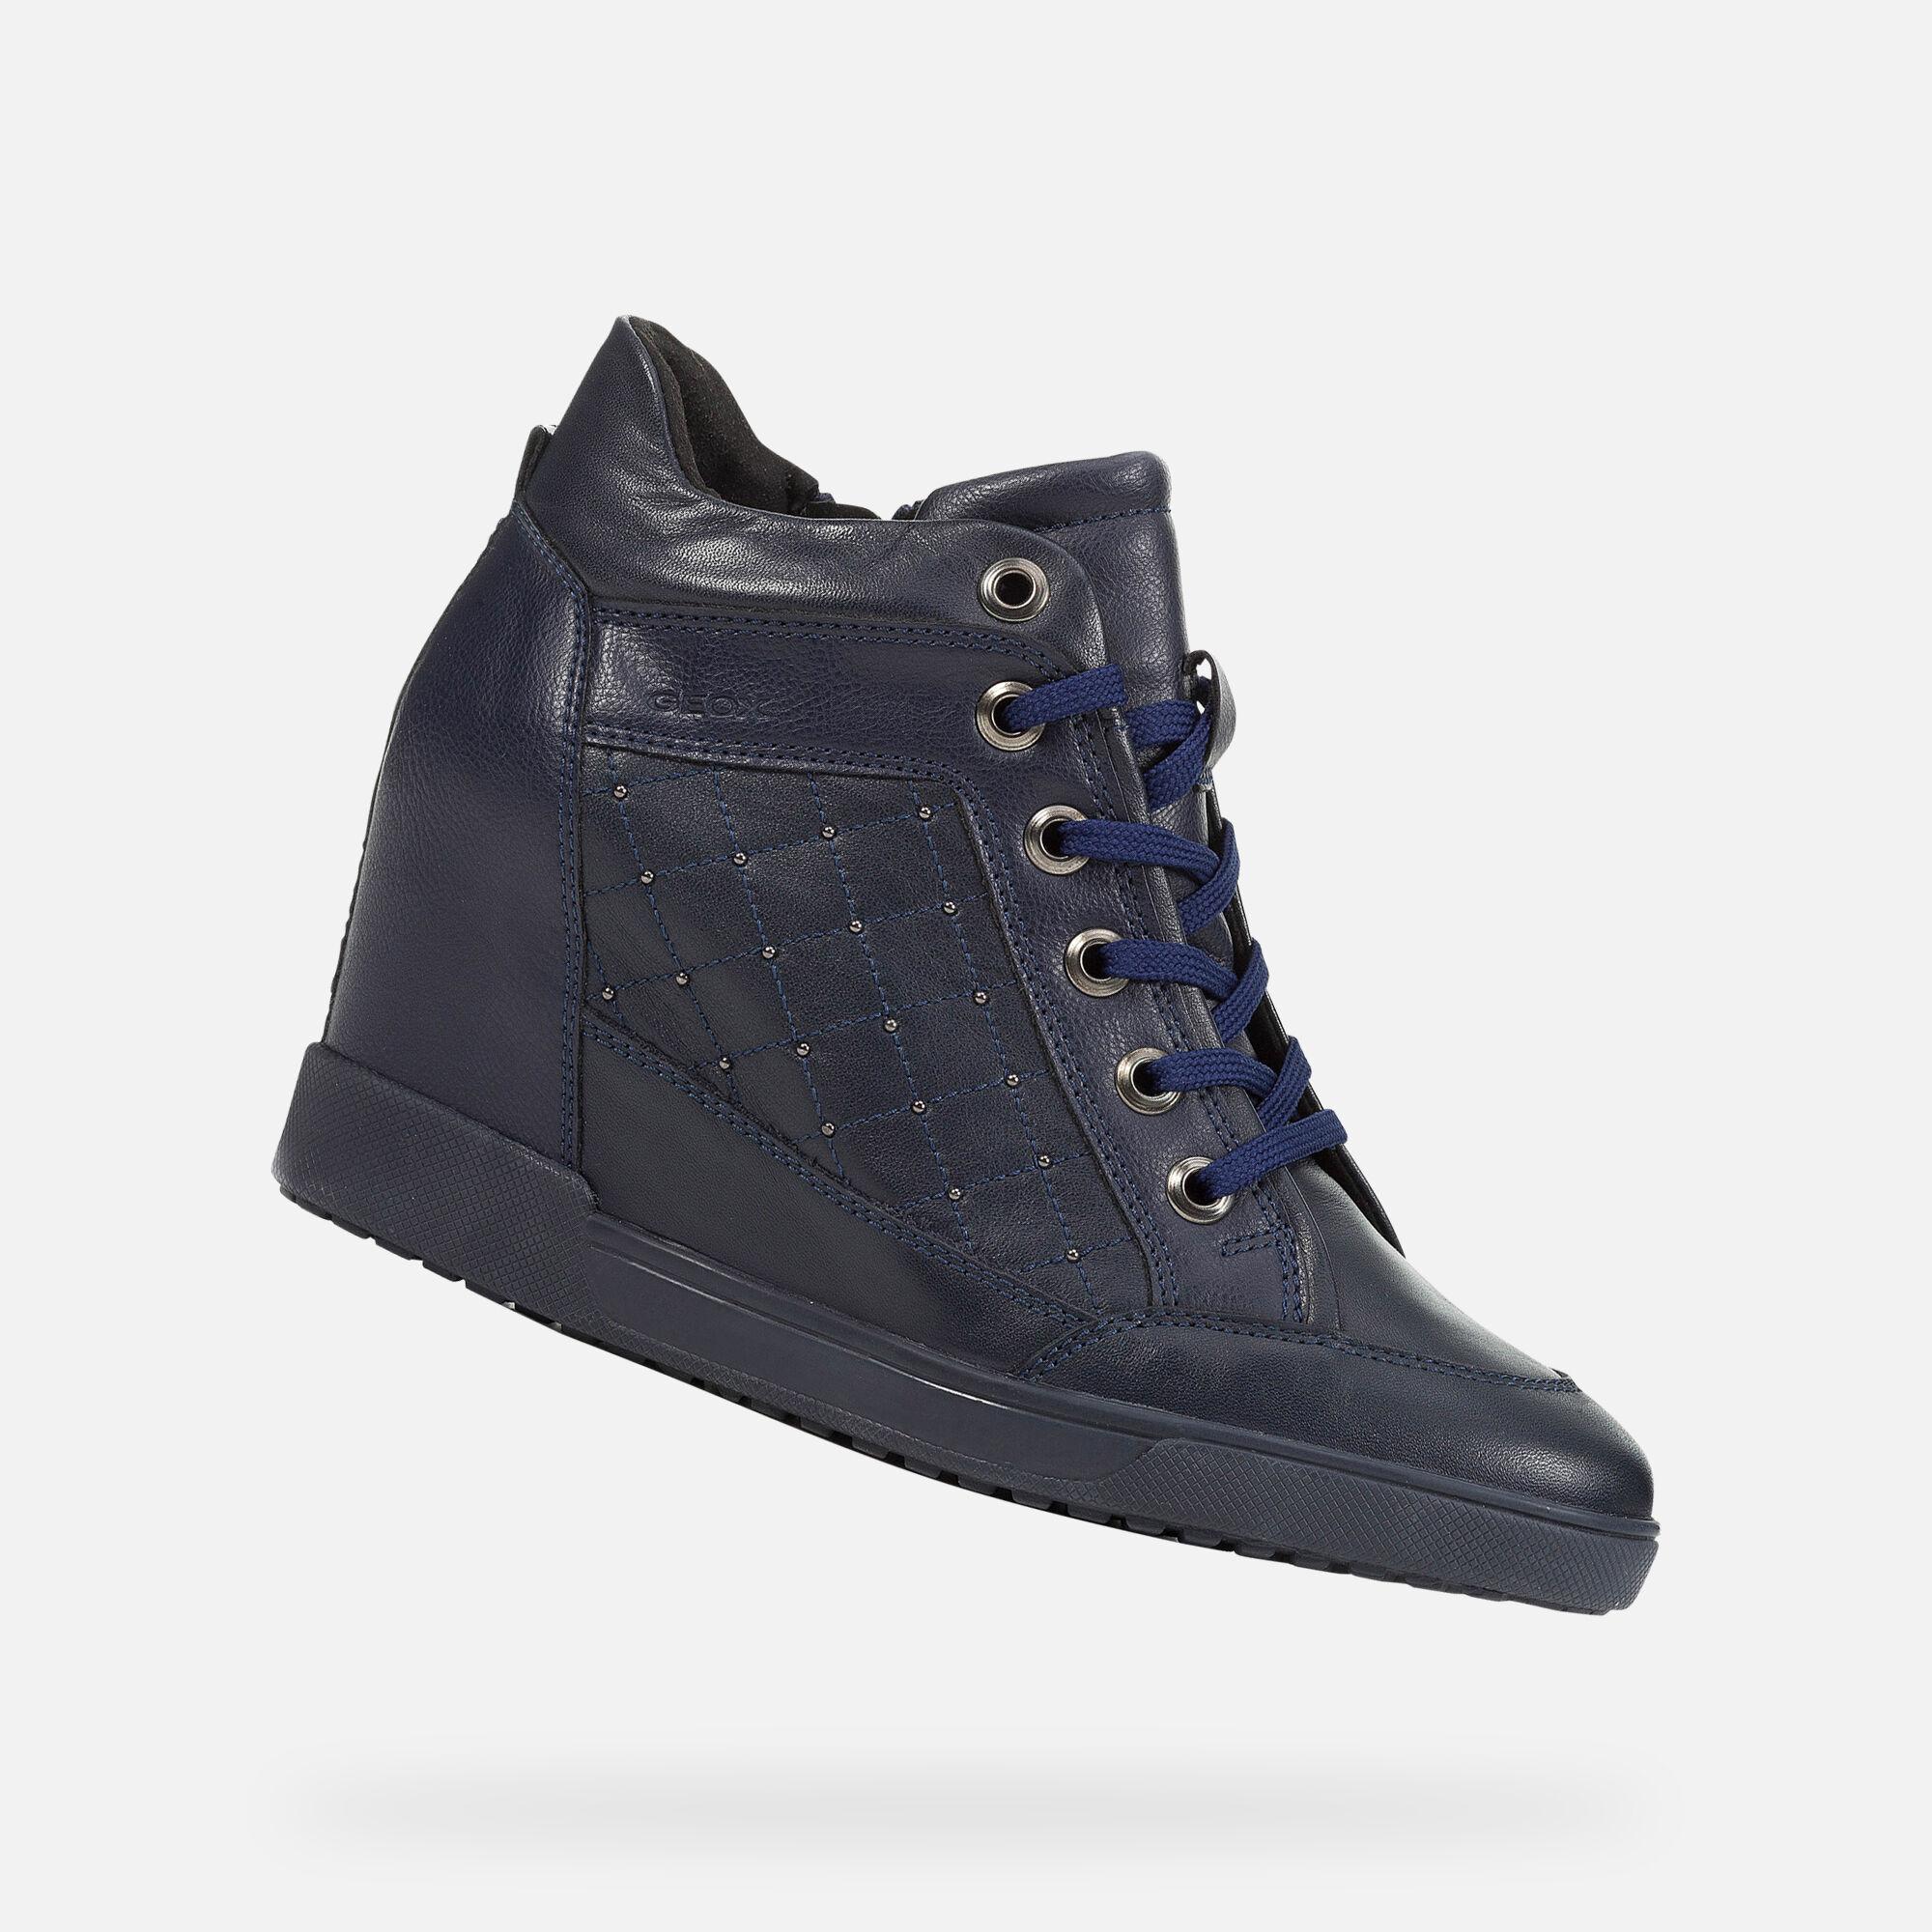 Sneakers Geox per donna in pelle e sintetico bianco zeppa alta